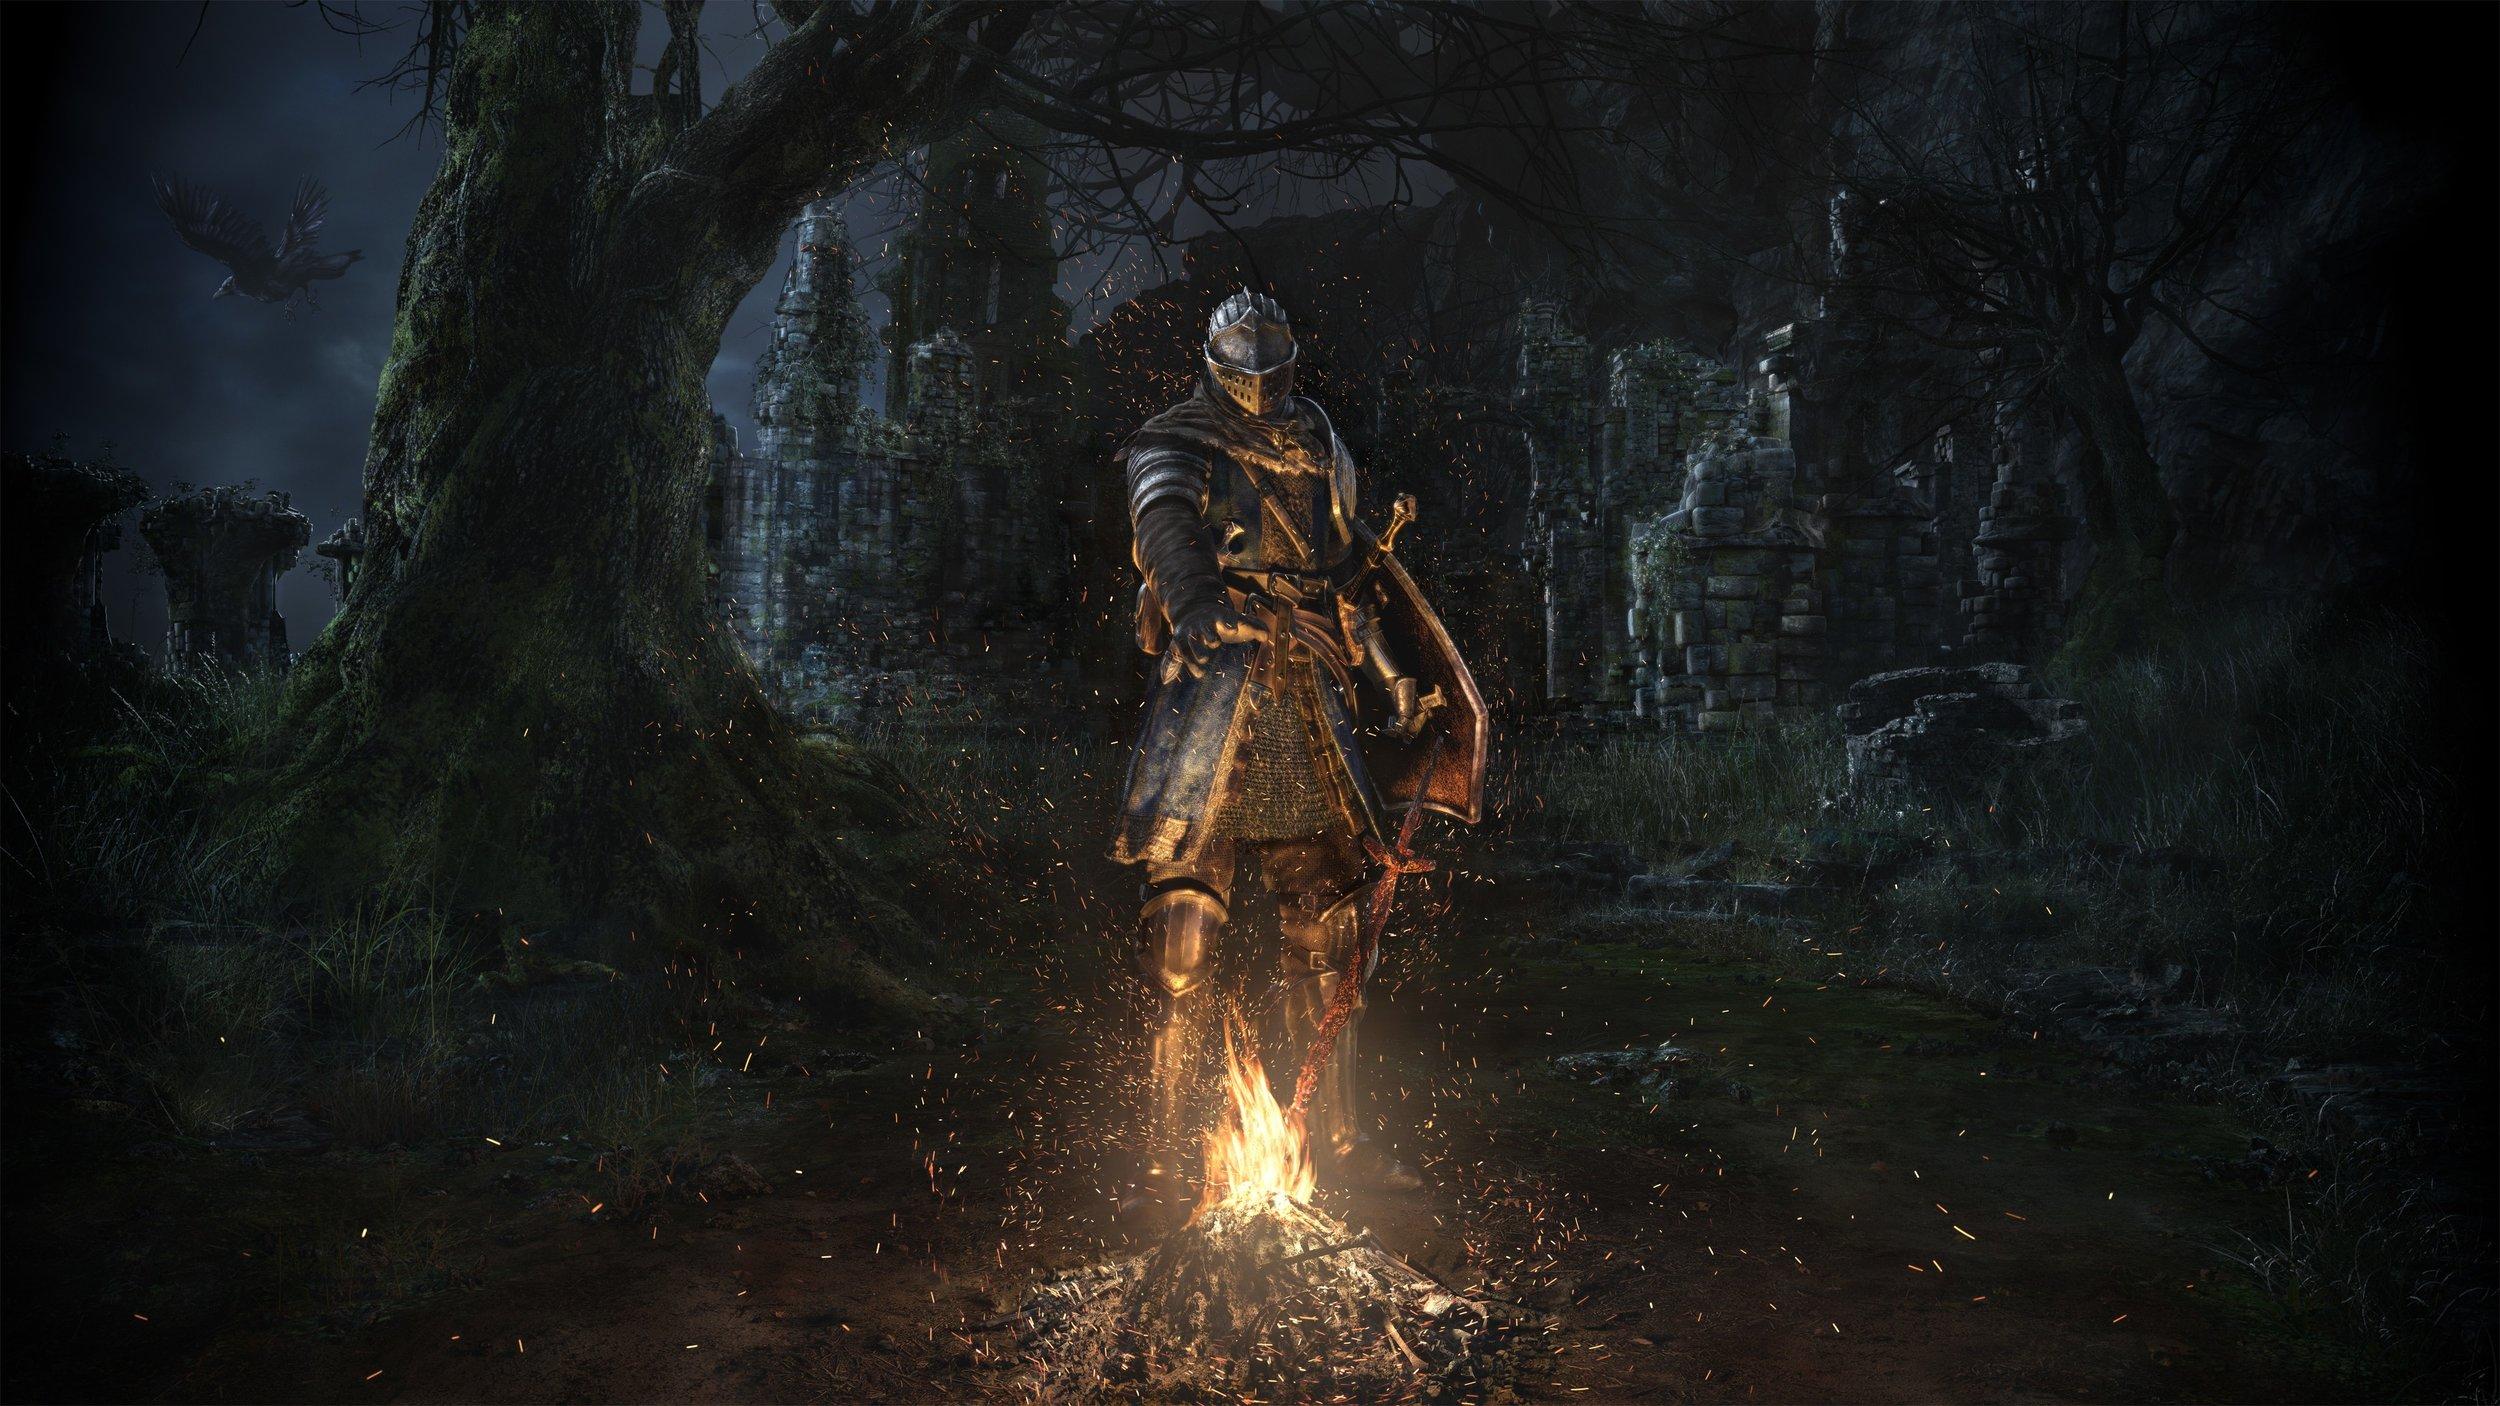 dark_souls_remastered_4k-3840x2160.jpg